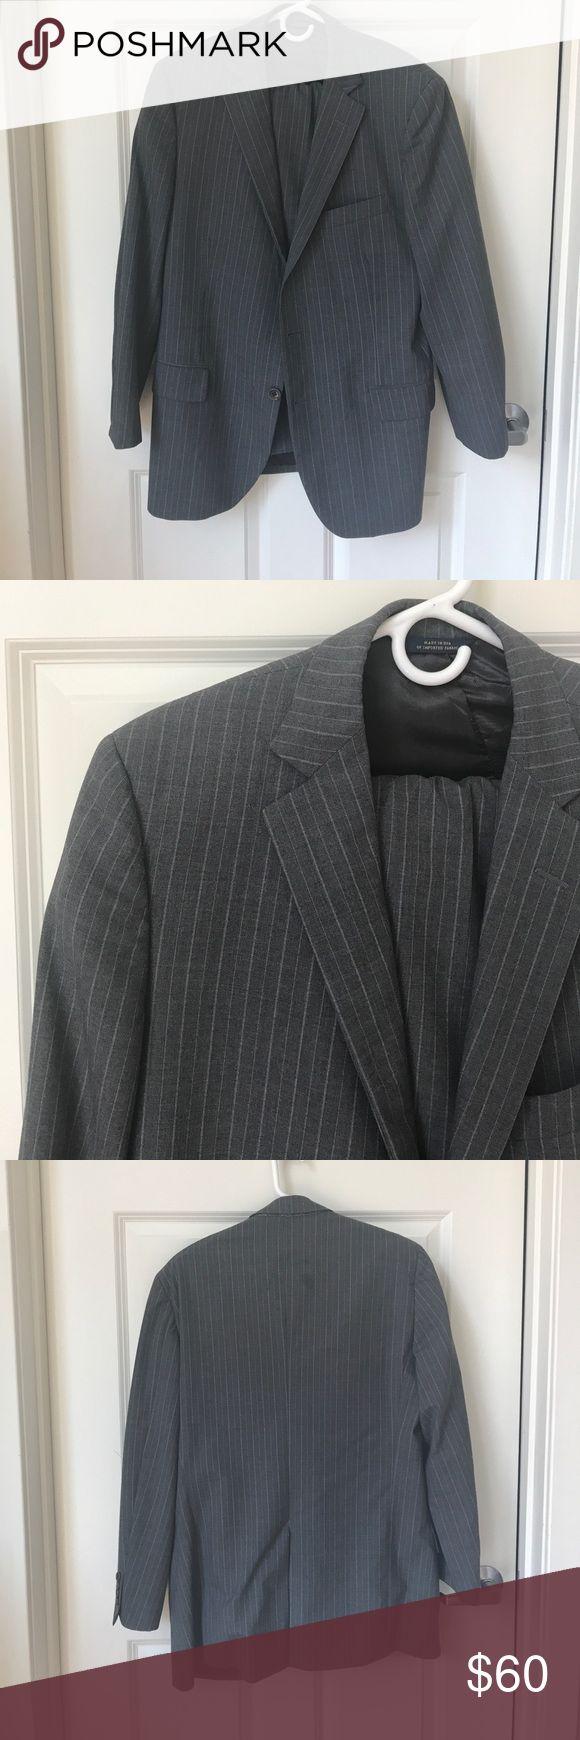 {BROOKS BROTHERS} Grey Pinstripe Suit 41R / 35W Brooks Brothers suit pants and jacket. Brooks Brothers Suits & Blazers Suits